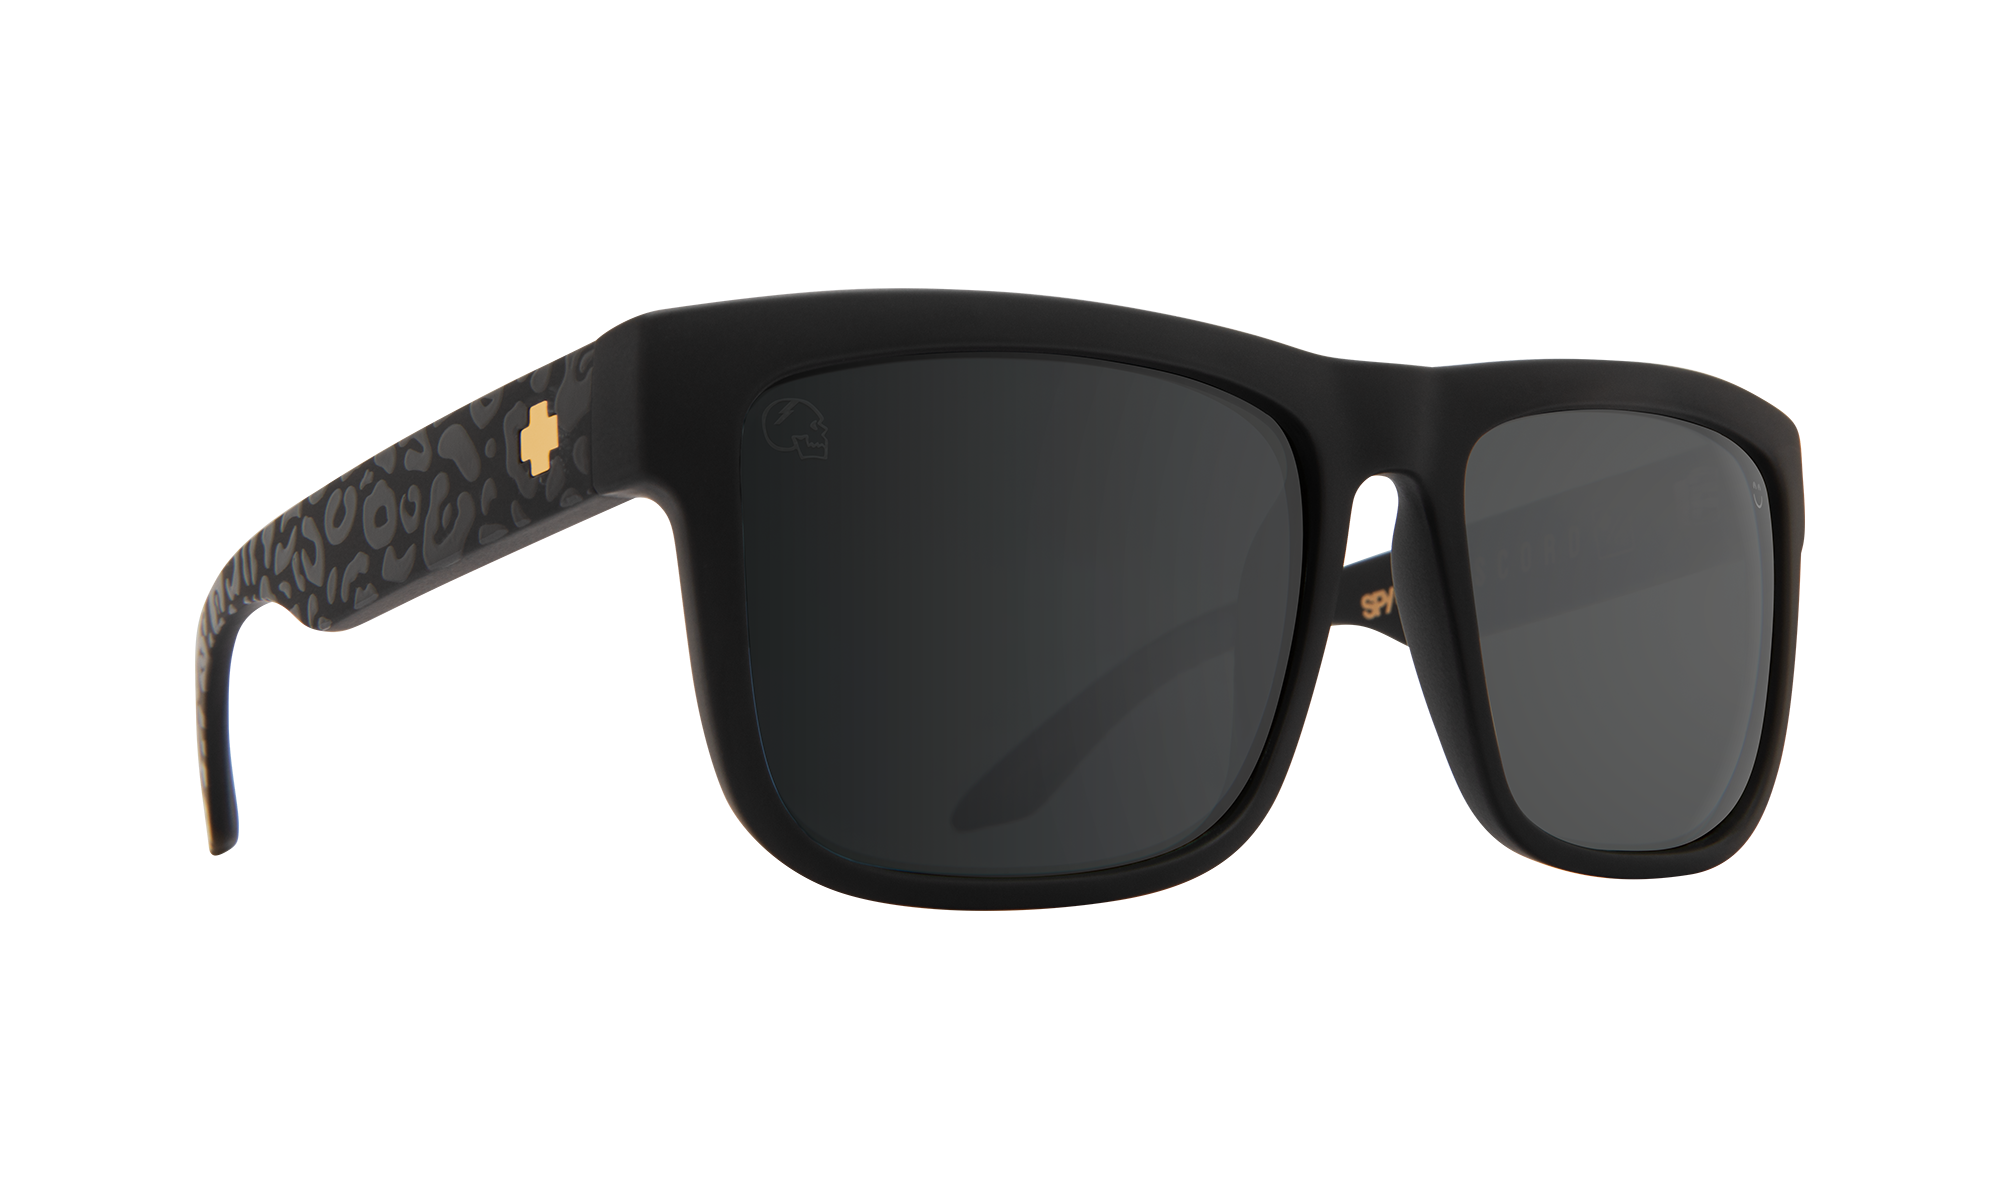 8715ce35bf2fb Spy Optic Discord Sunglasses FREE S H 673119152713